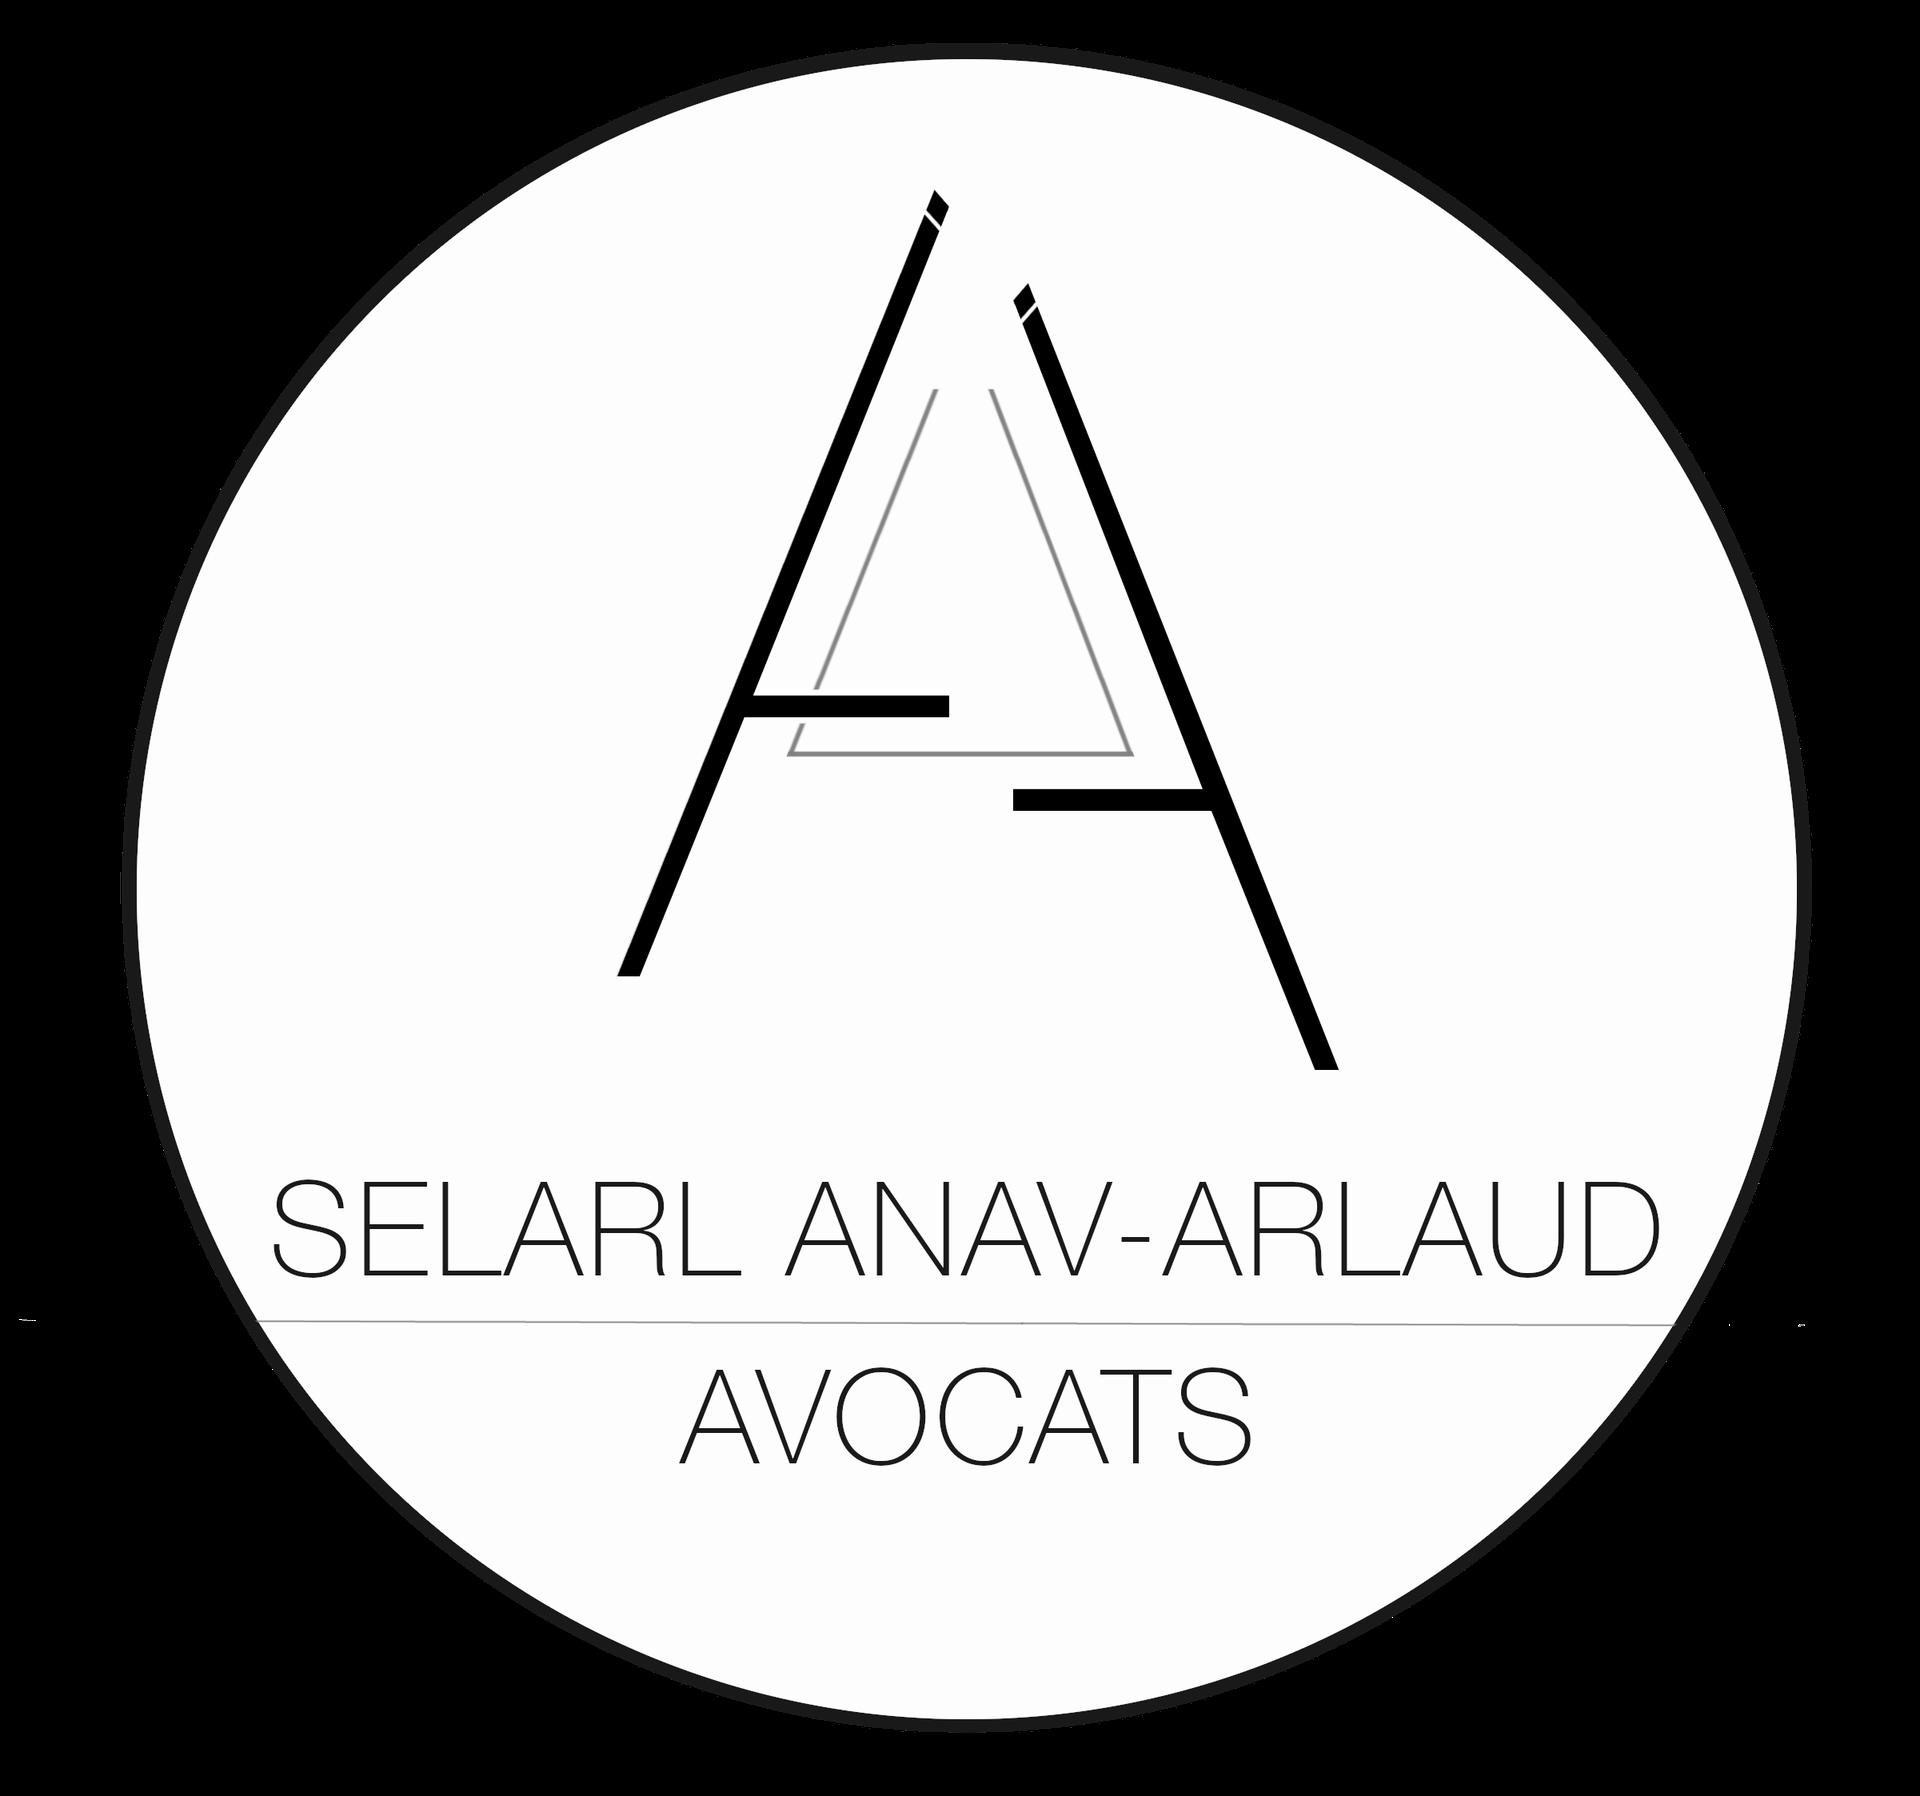 BENEDICTE ANAV-ARLAUD avocat